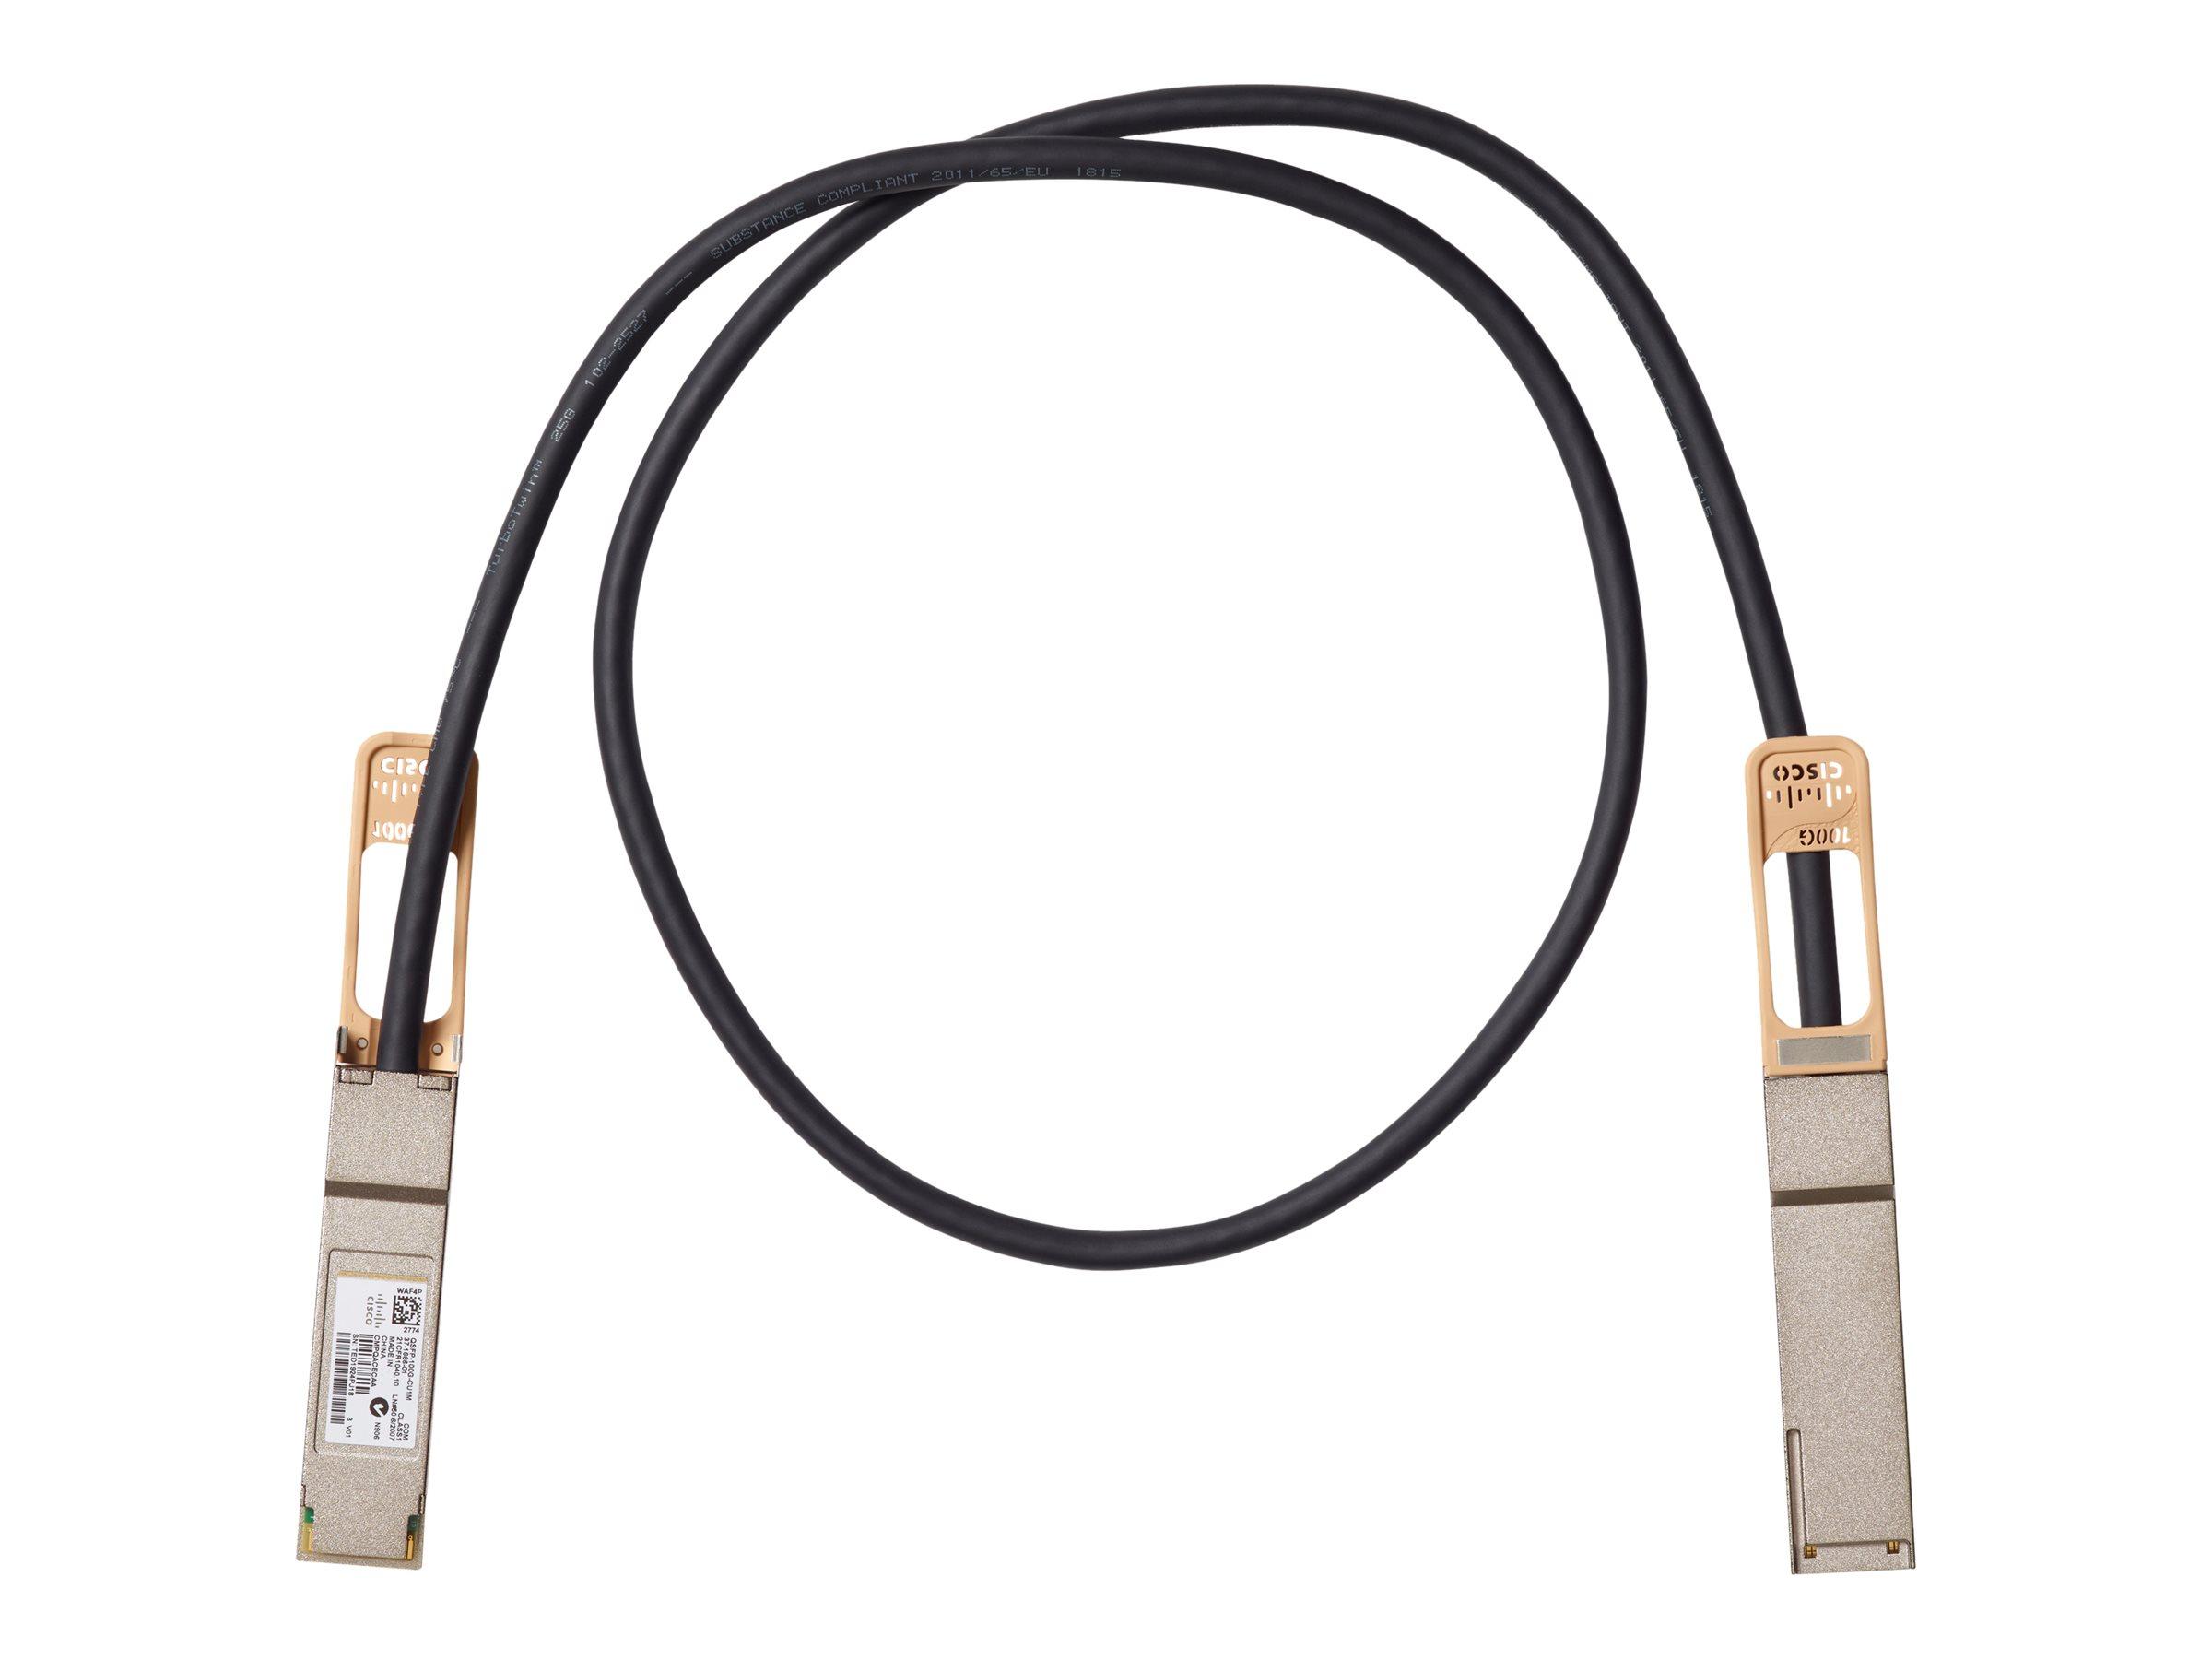 Cisco 100GBASE-CR4 Passive Copper Cable - Direktanschlusskabel